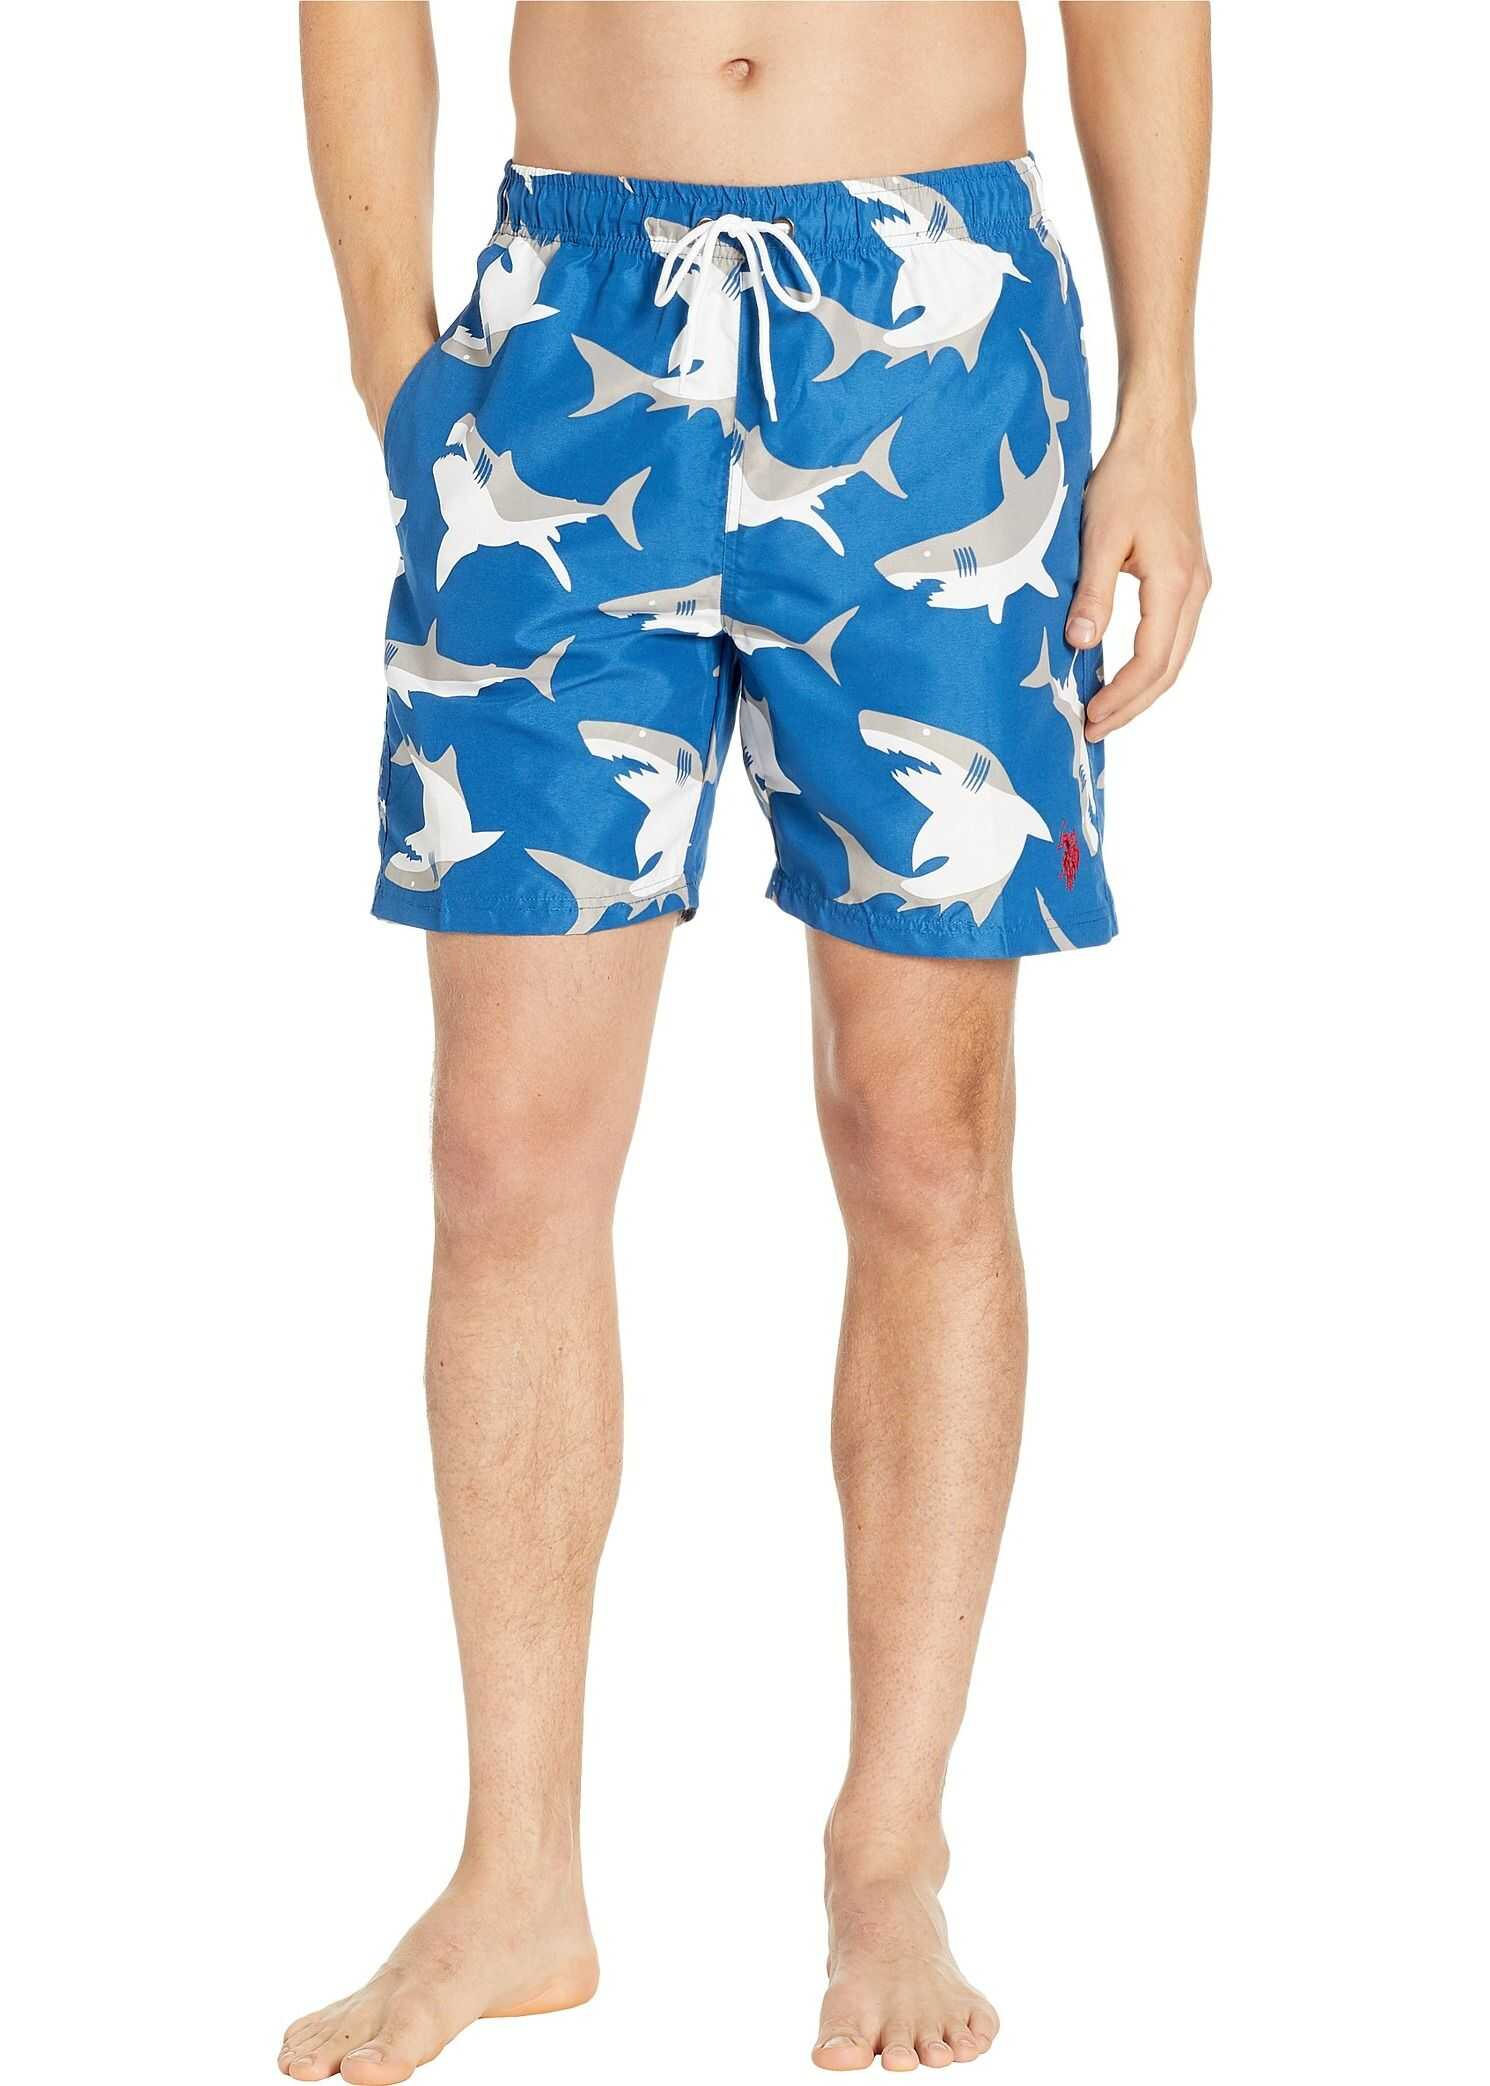 U.S. POLO ASSN. Shark Swim Shorts Blue Whale